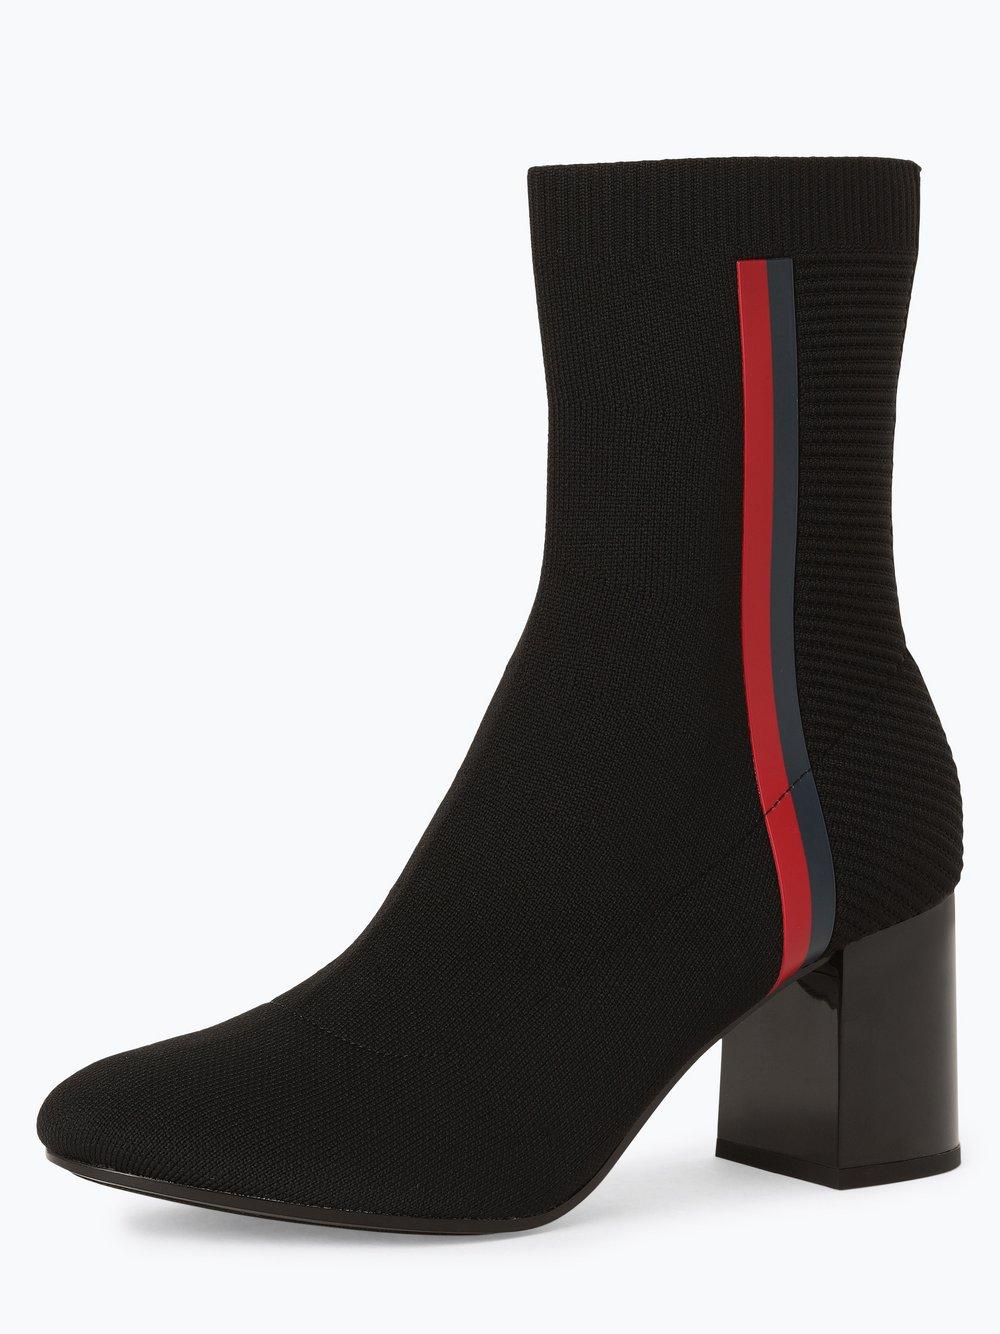 Tommy Hilfiger - Damskie botki – Knitted Heeled Boot, czarny